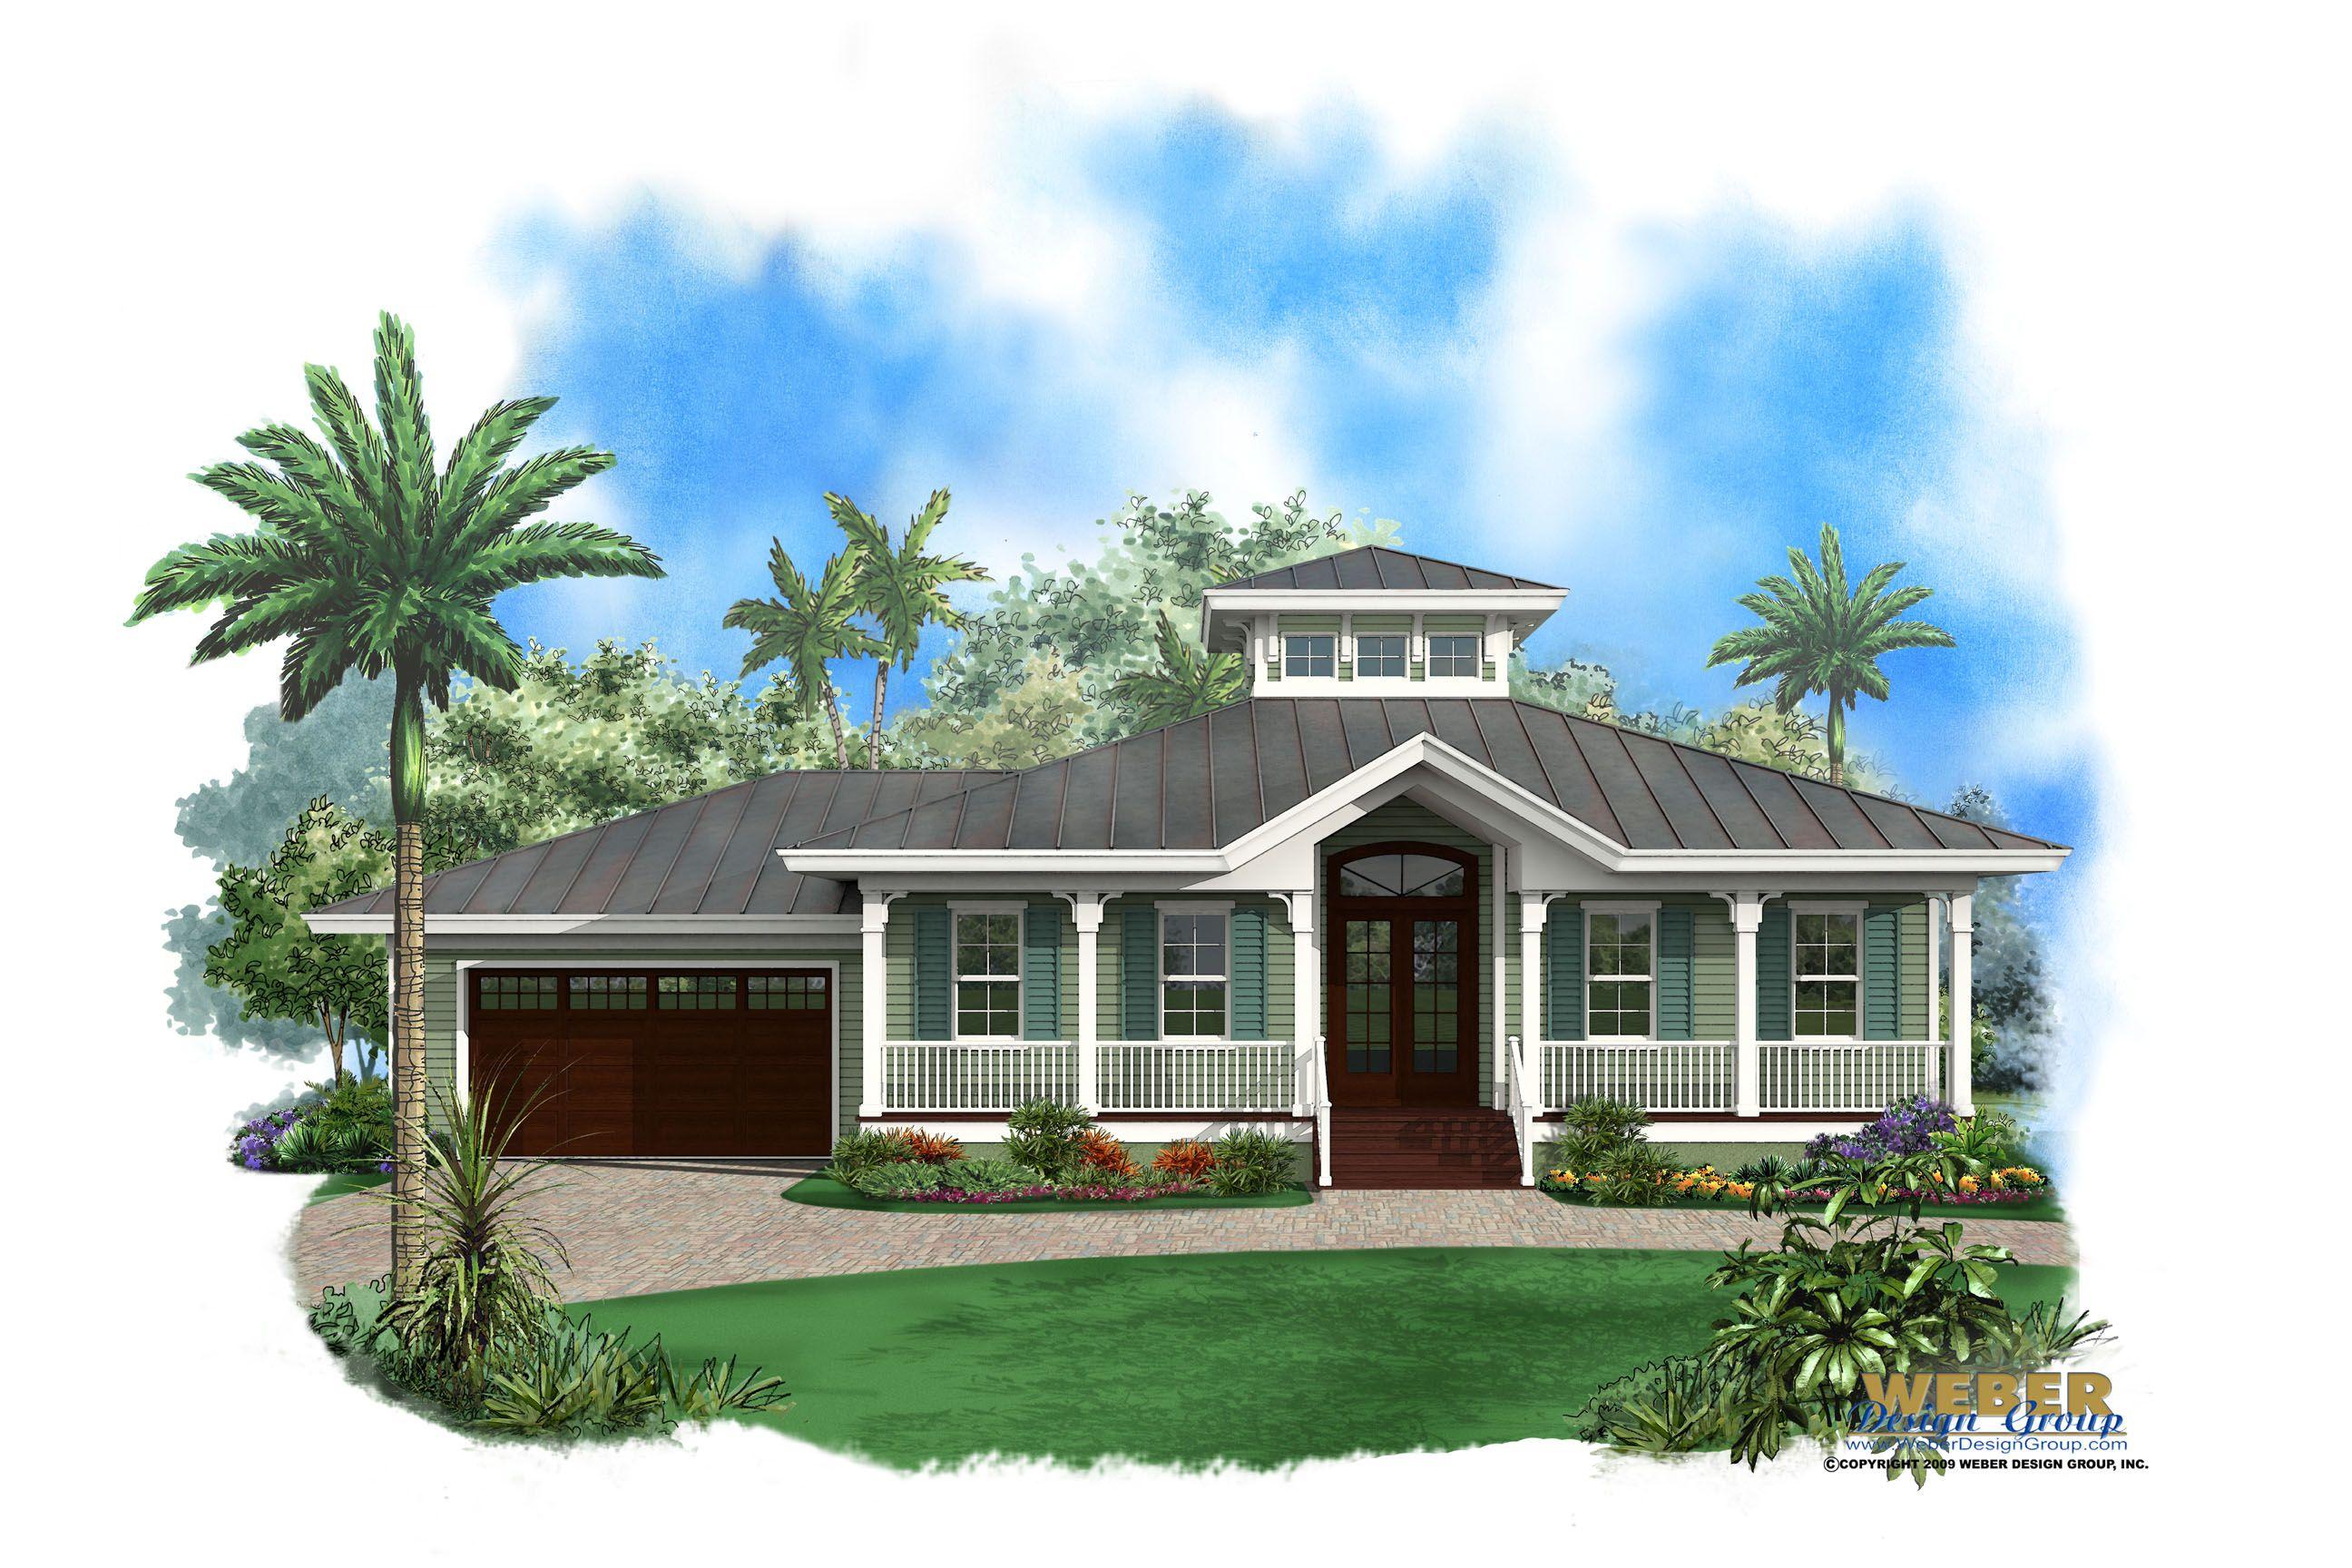 House Plans Stock Home Floor Plans Weber Design Group Florida House Plans Coastal House Plans Beach House Plans